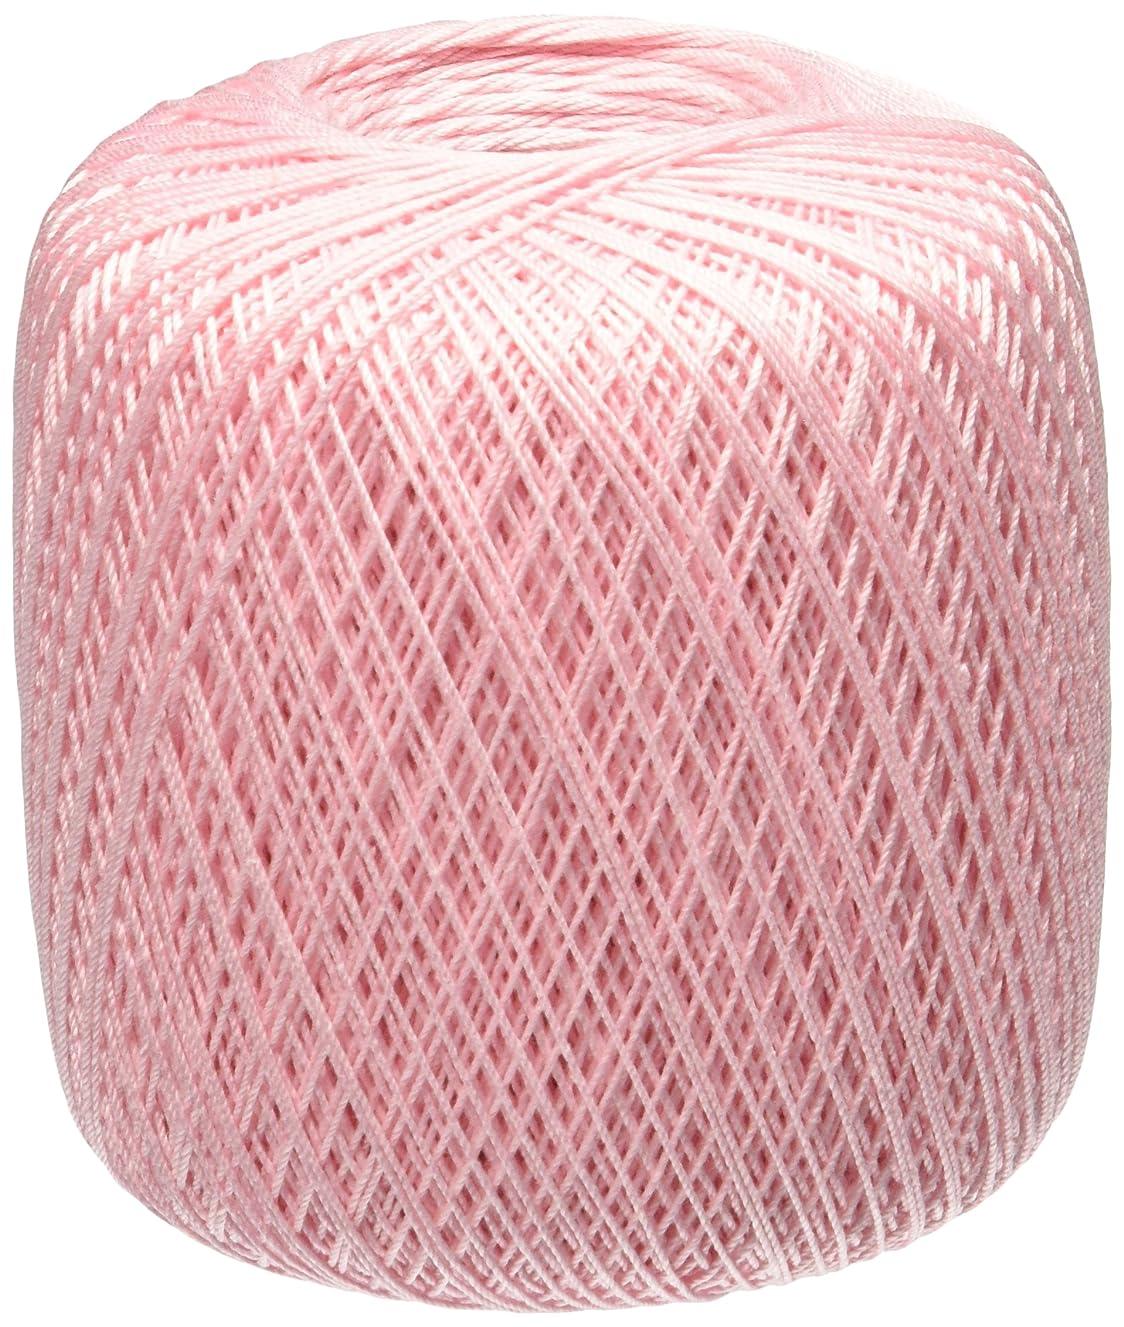 Coats Crochet 154-401 Aunt Lydia's Crochet, Cotton Classic Size 10, Orchid Pink ojilf7894